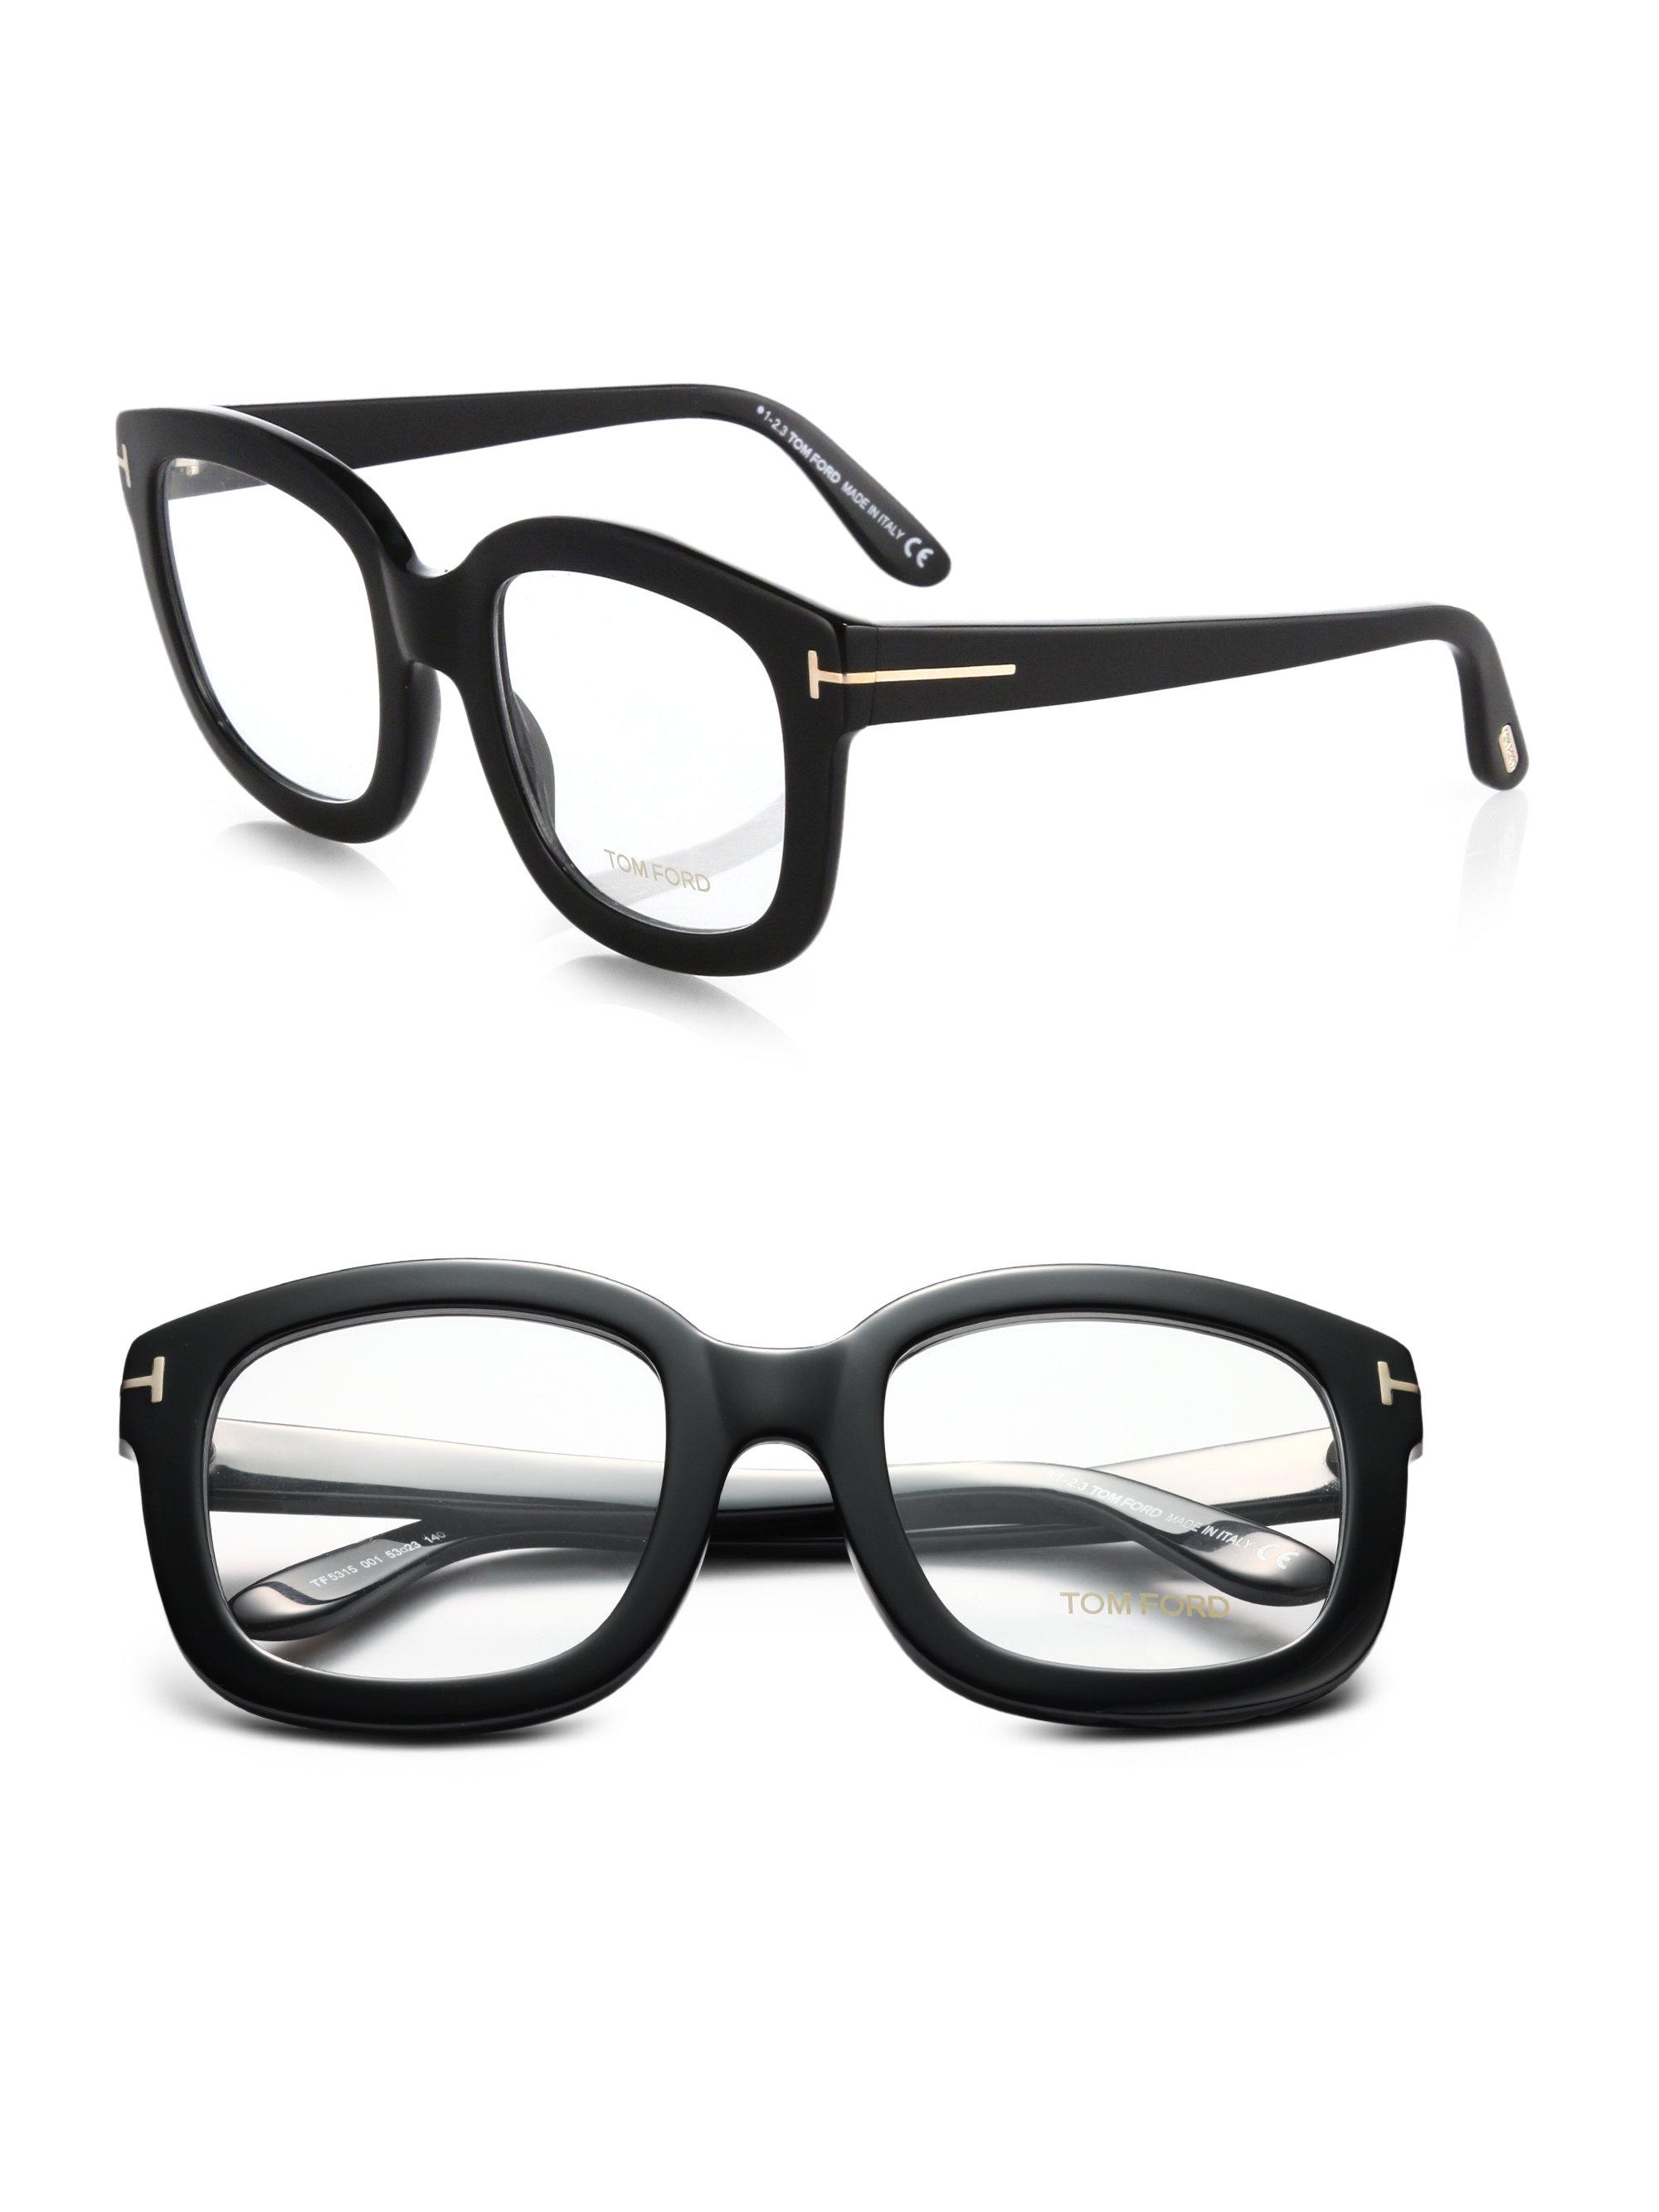 dedbbcaa2f771 Tom Ford Oversized Acetate Eye Glasses in Black - Lyst